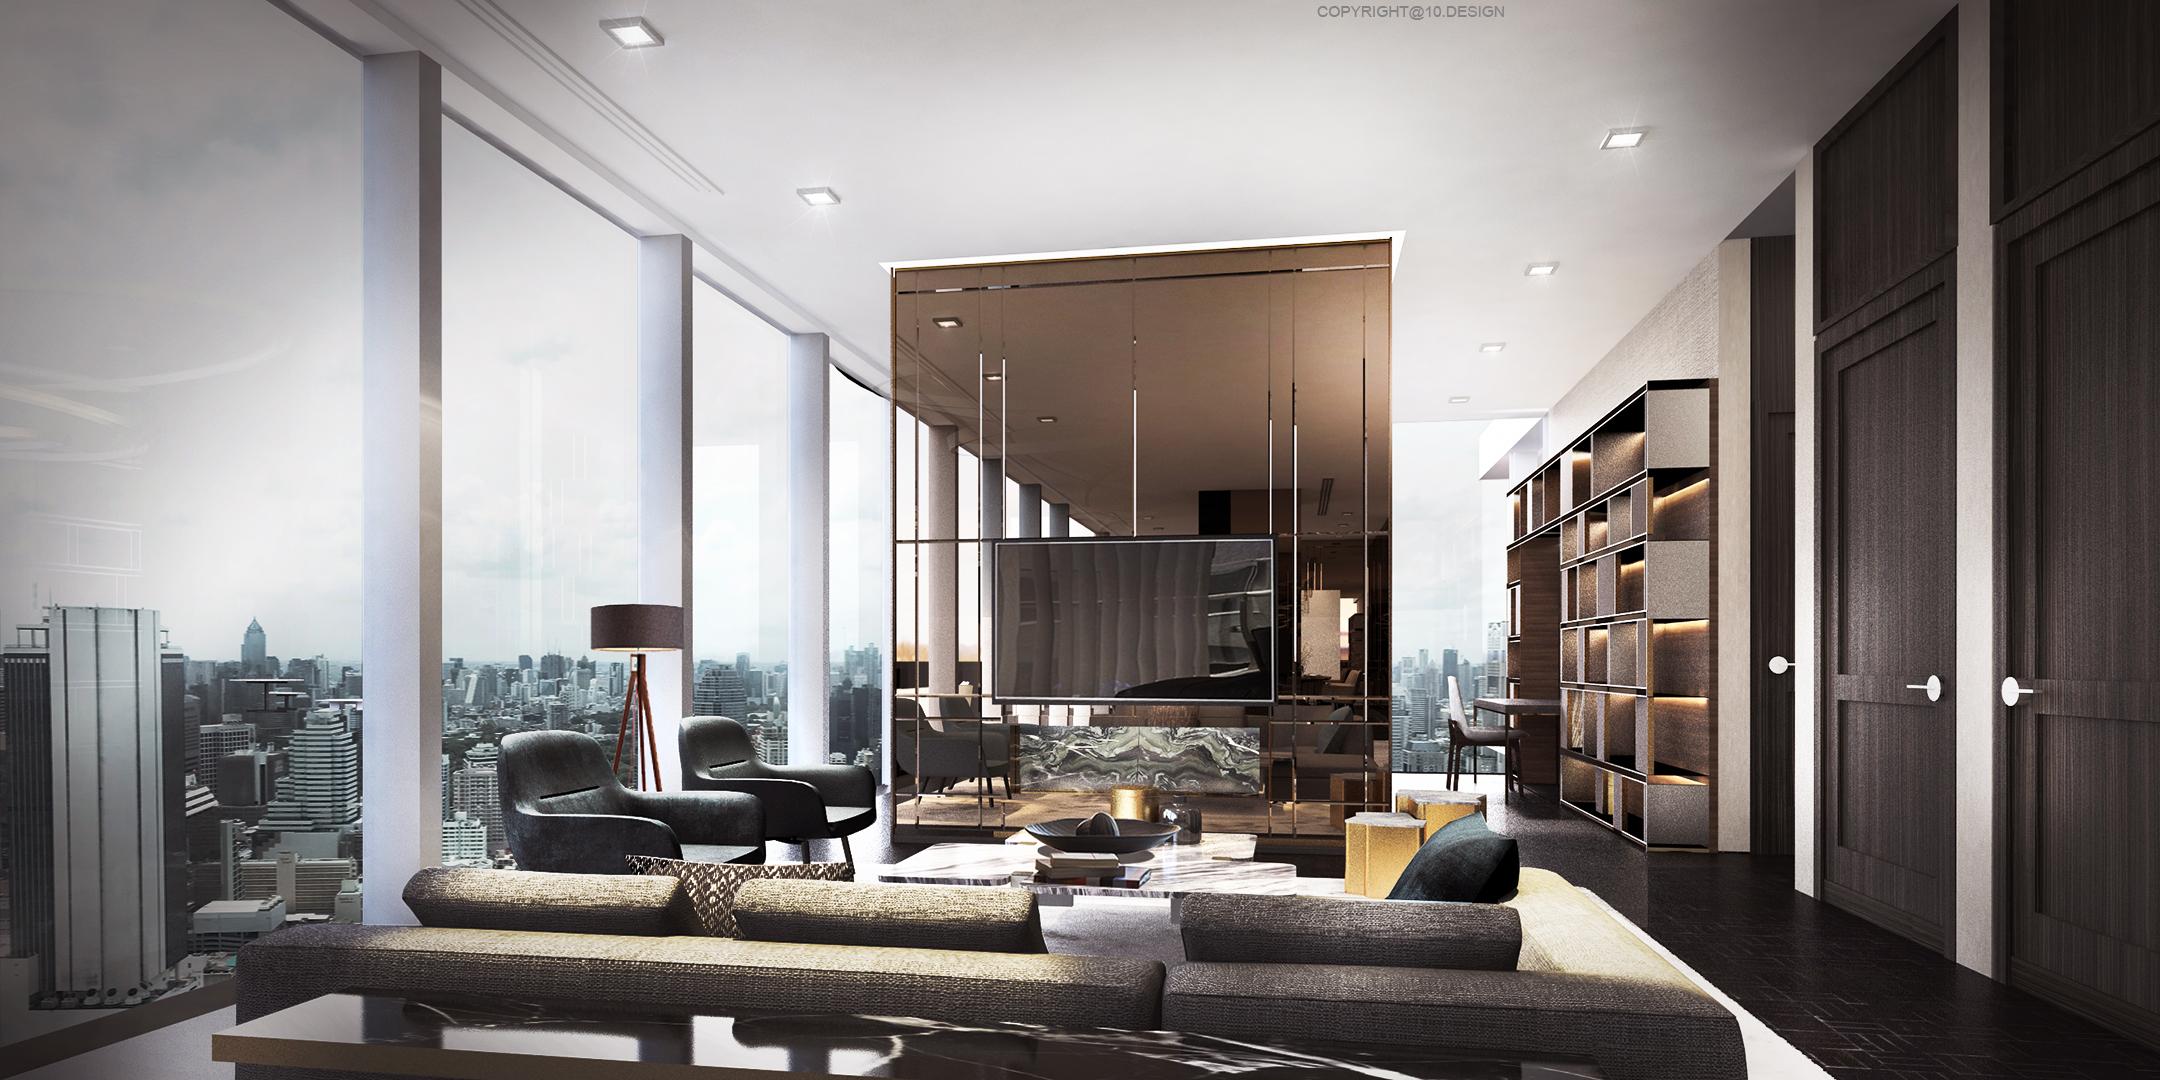 10.design mahanakorn residence interior design 05